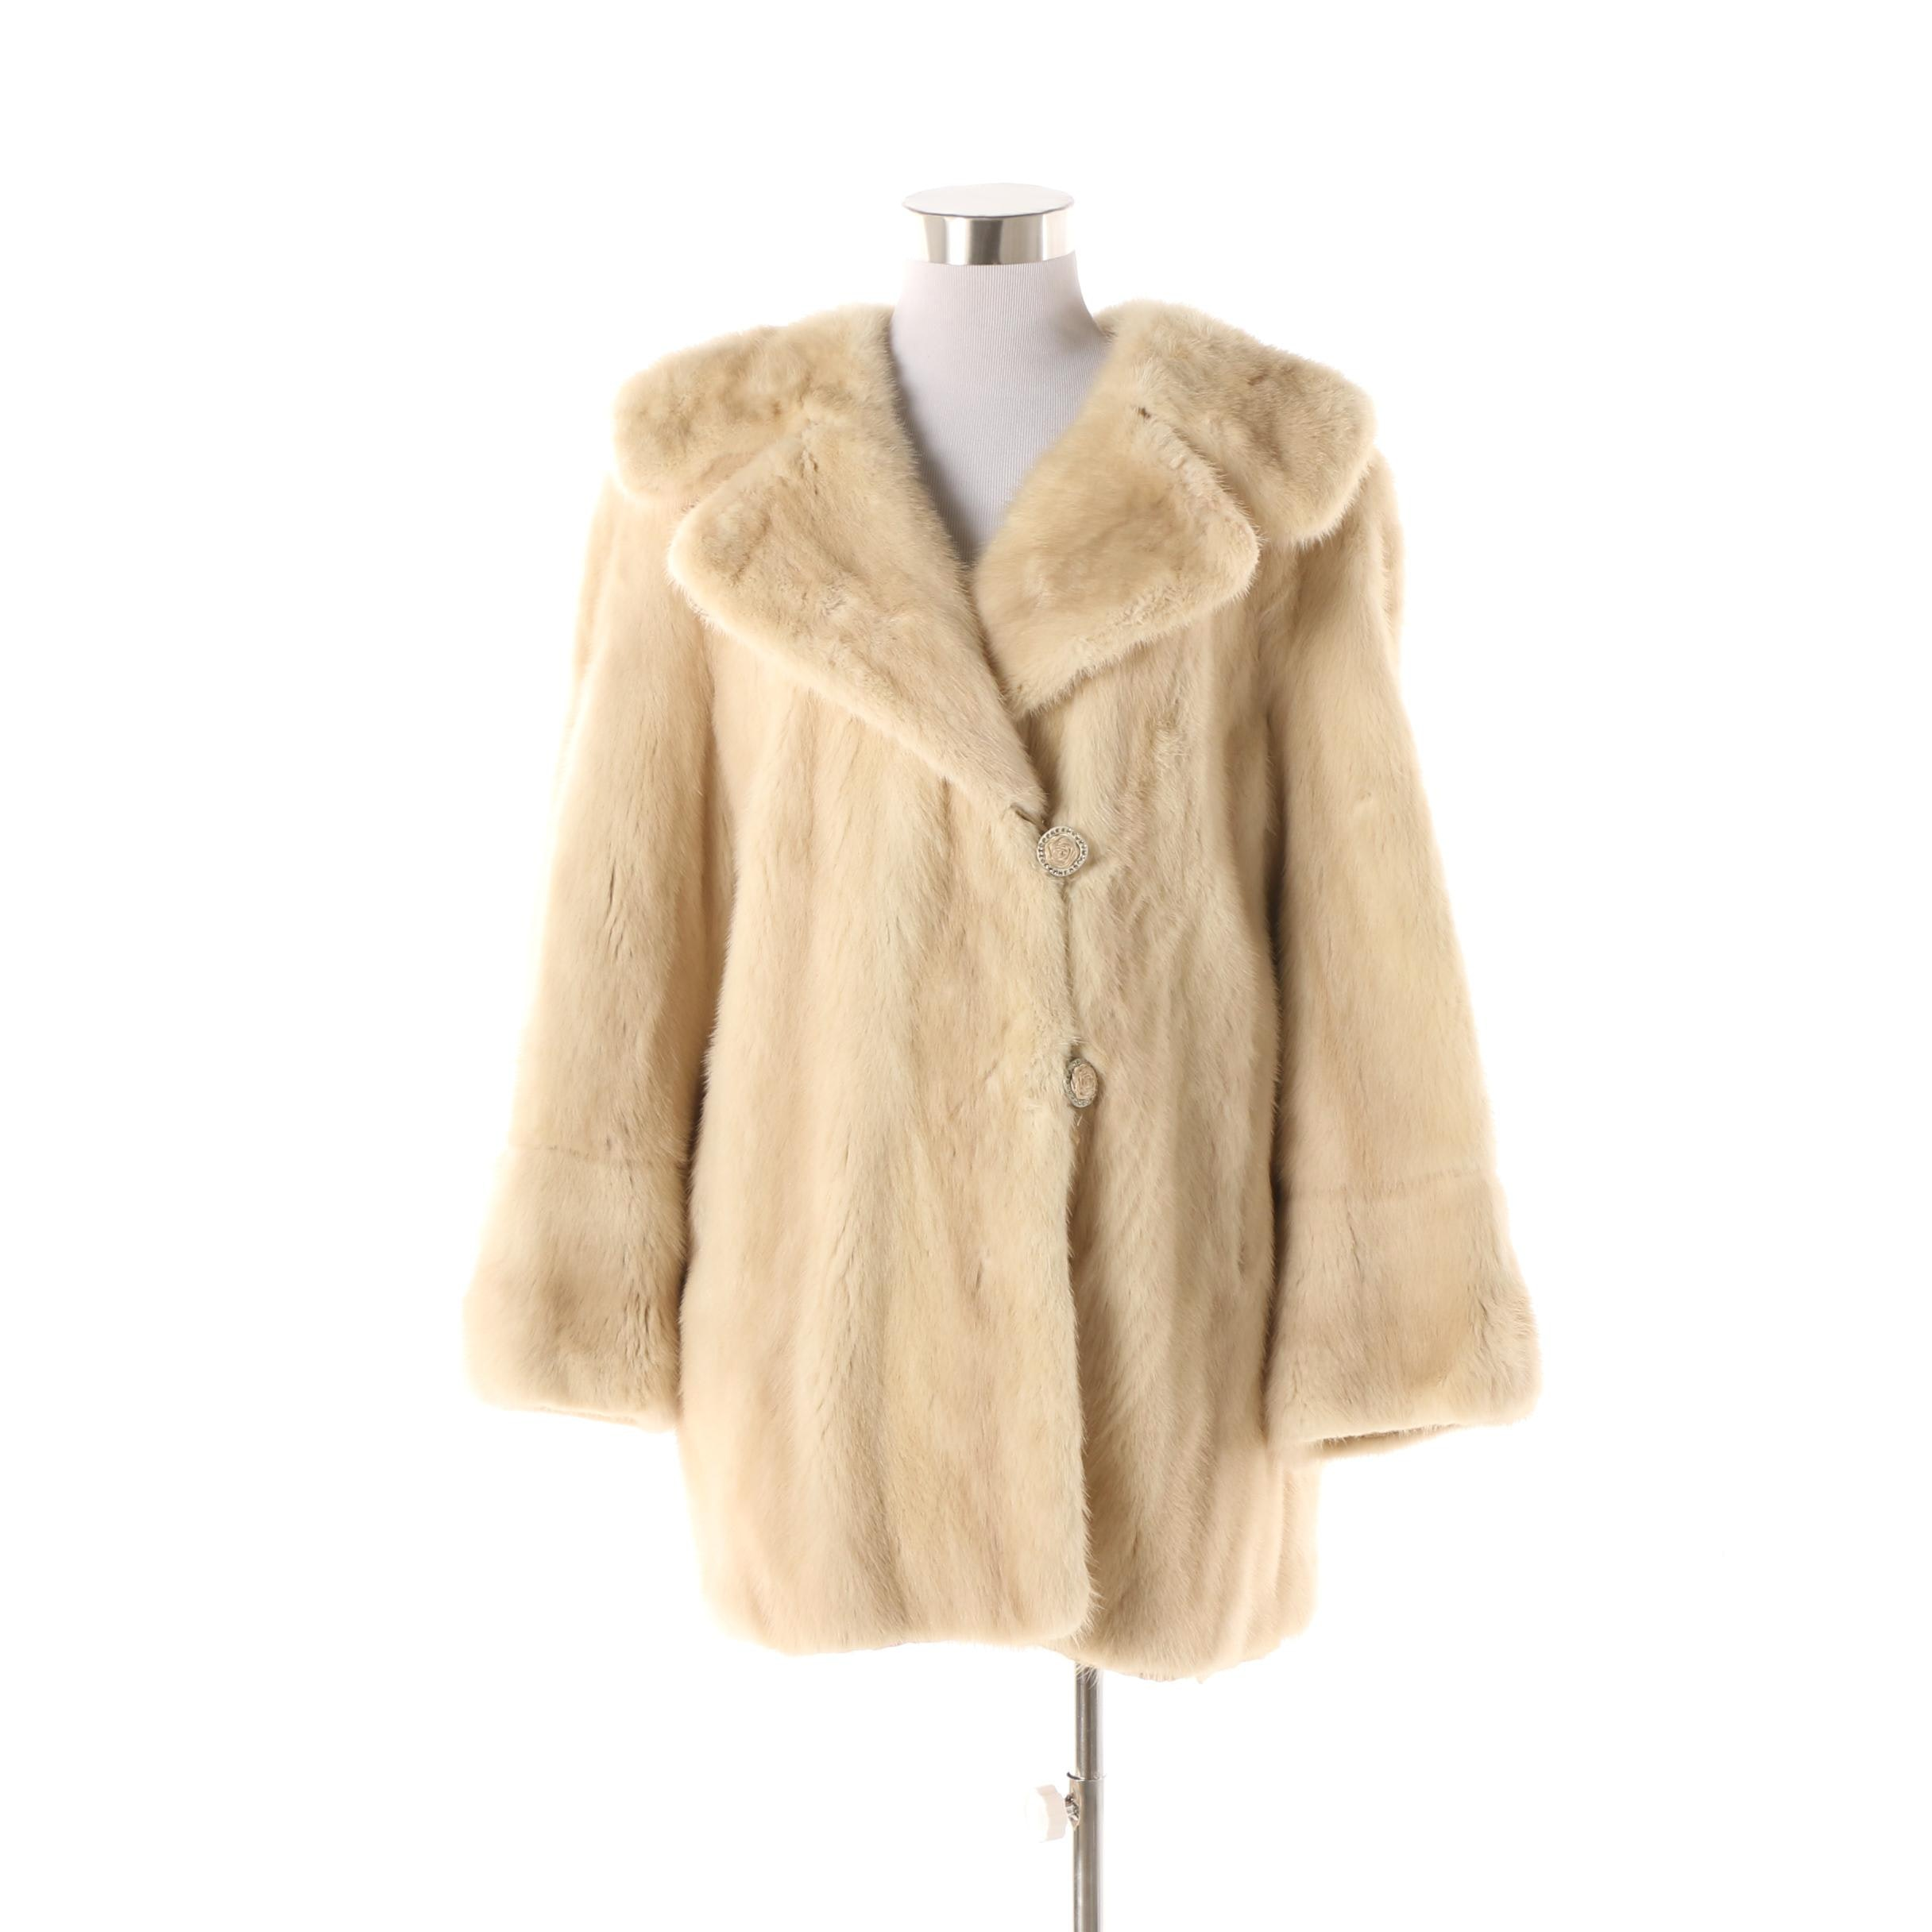 Vintage G. Pappas Blonde Mink Fur Coat with Rose Buttons